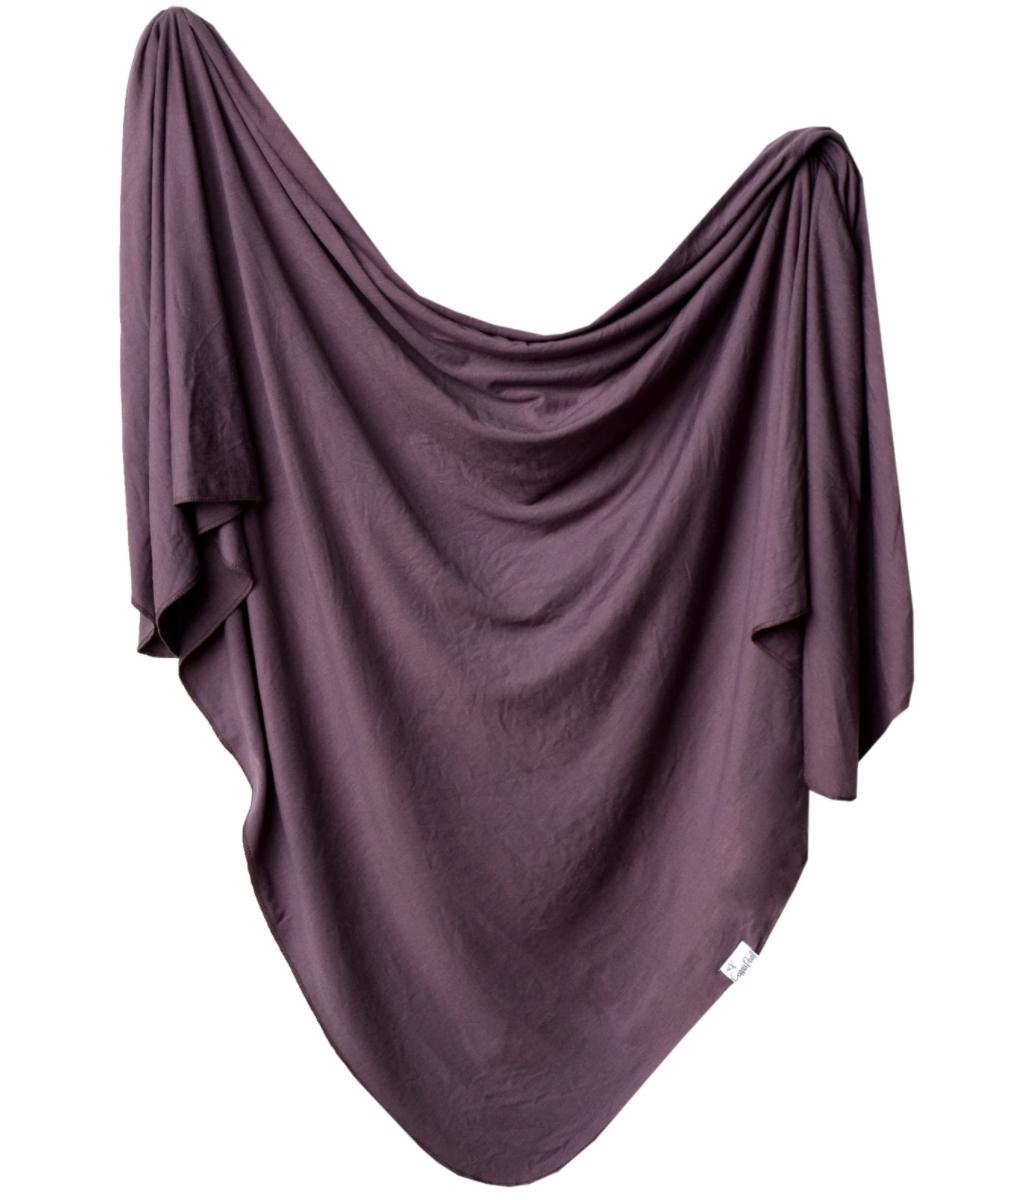 Copper Pearl Knit Swaddle Blanket - Plum